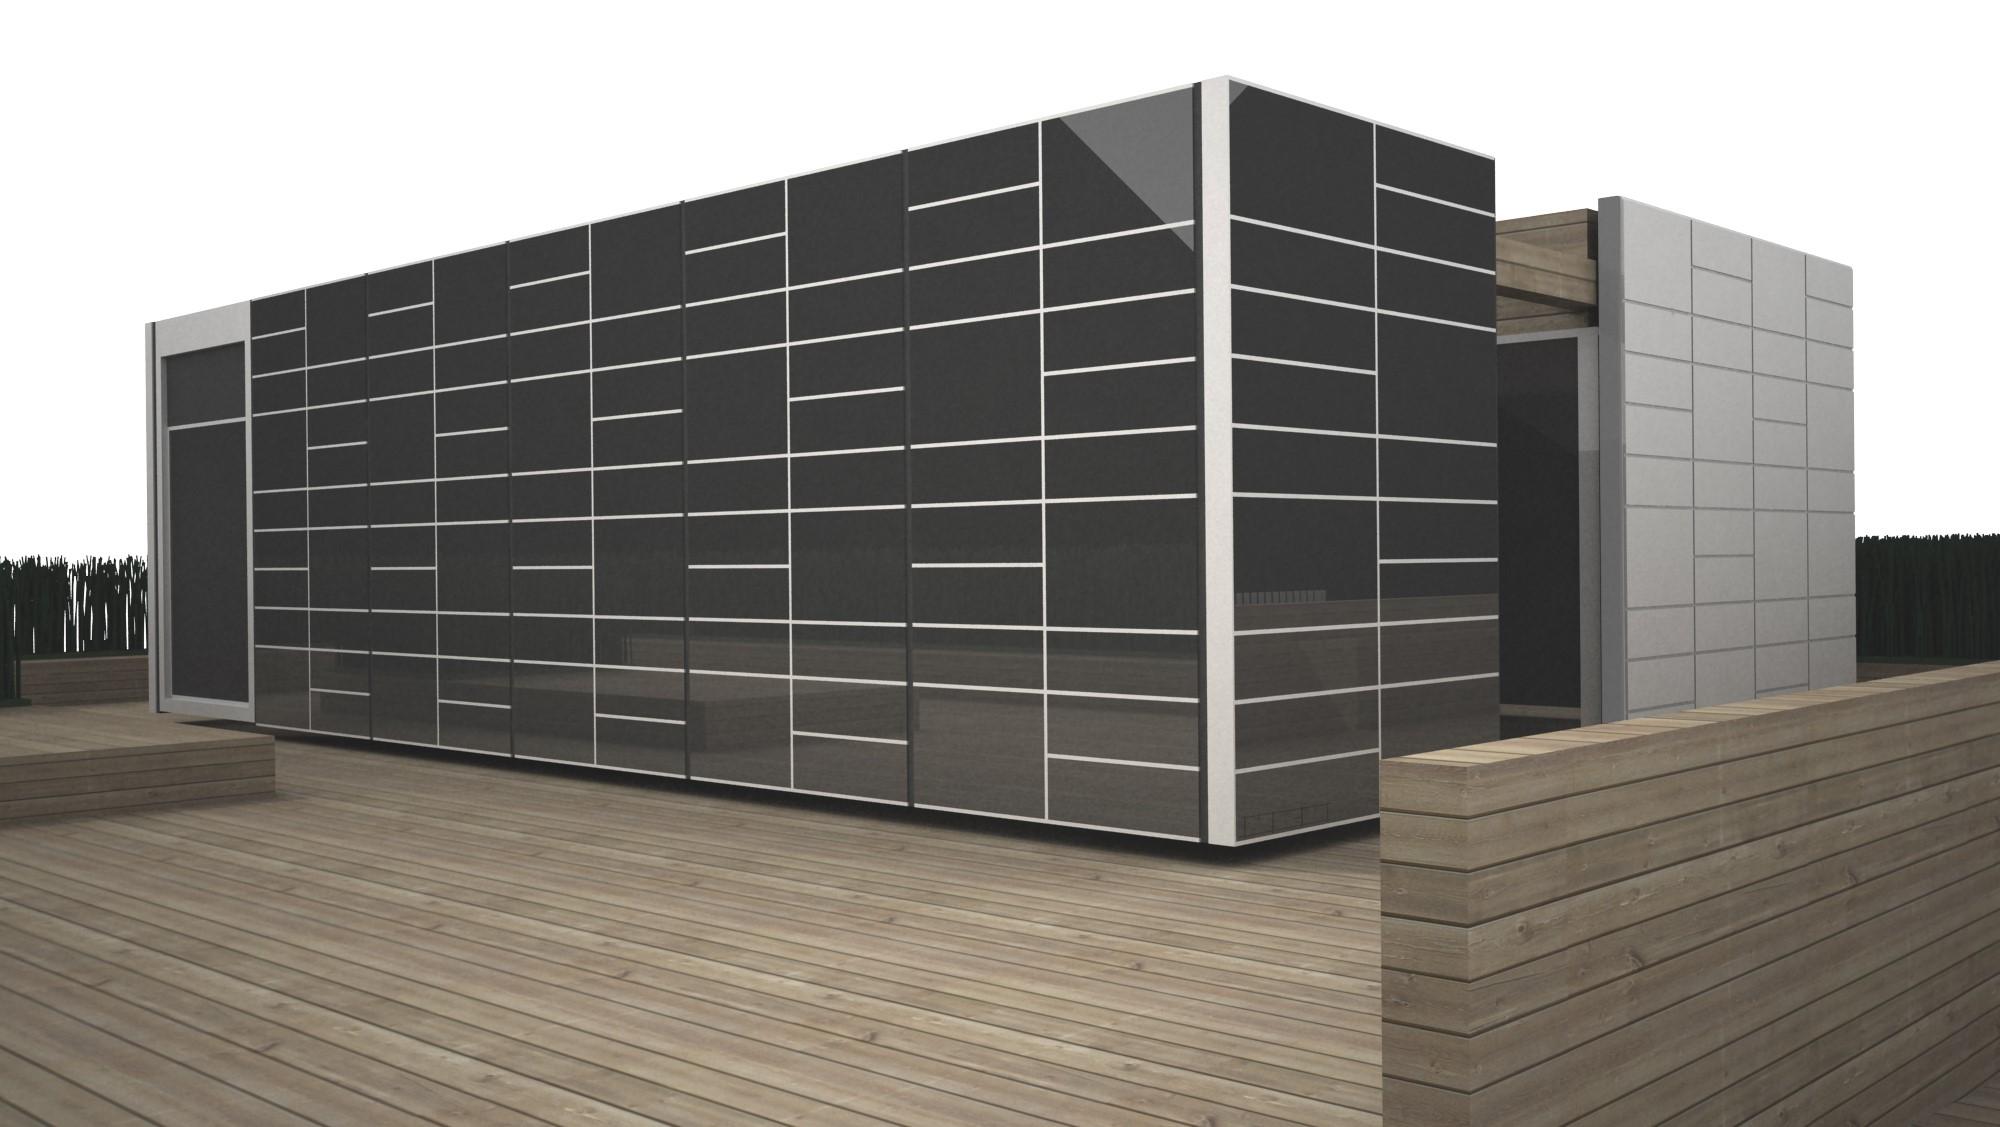 Fachadas-inteligentes-tambi%c3%a9n-en-edificios-existentes-01